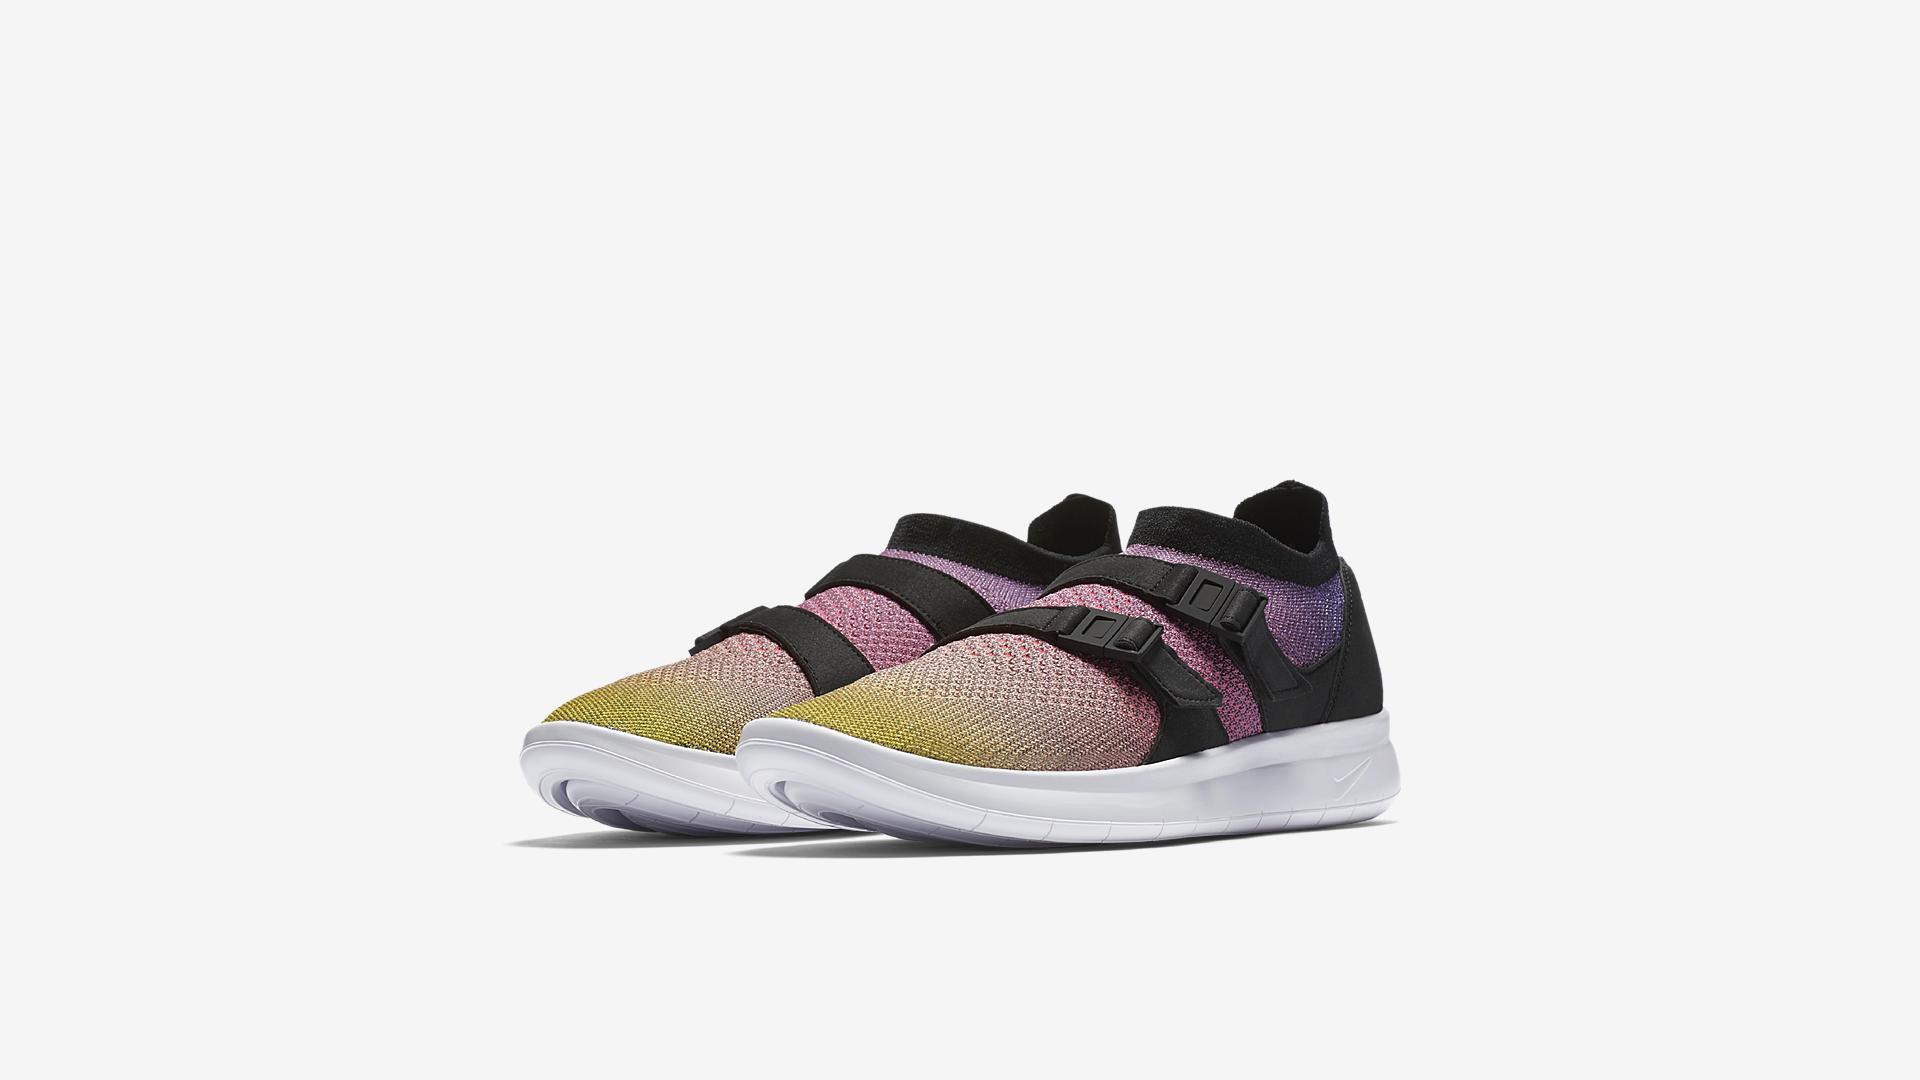 Nike Air Sock Racer Ultra Flyknit Premium Rainbow 898021 700 1